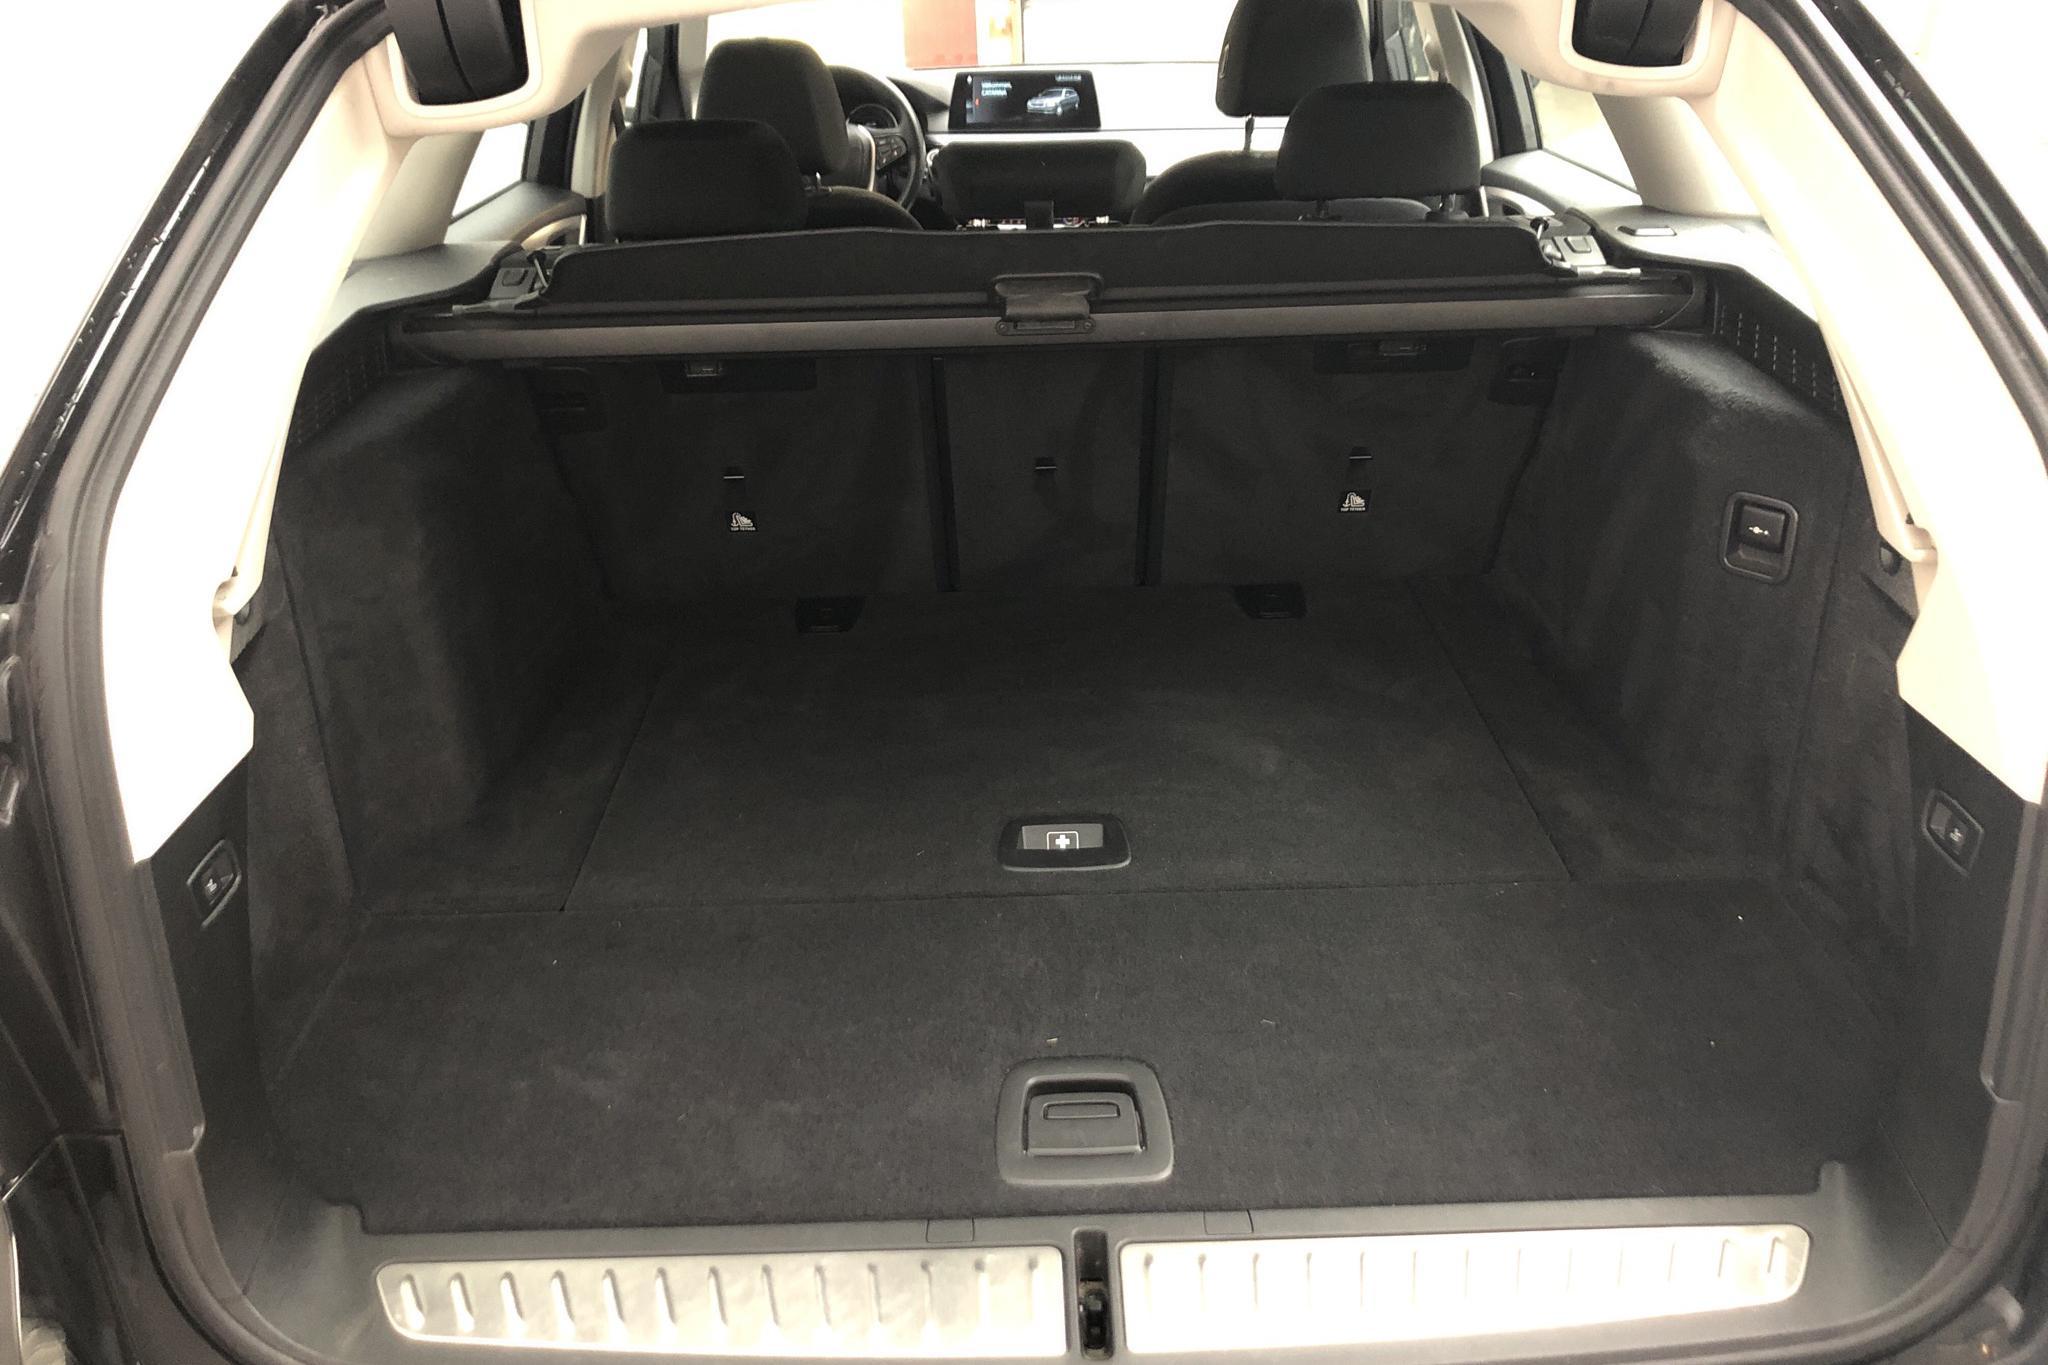 BMW 520d Touring, G31 (190hk) - 82 830 km - Automatic - black - 2018